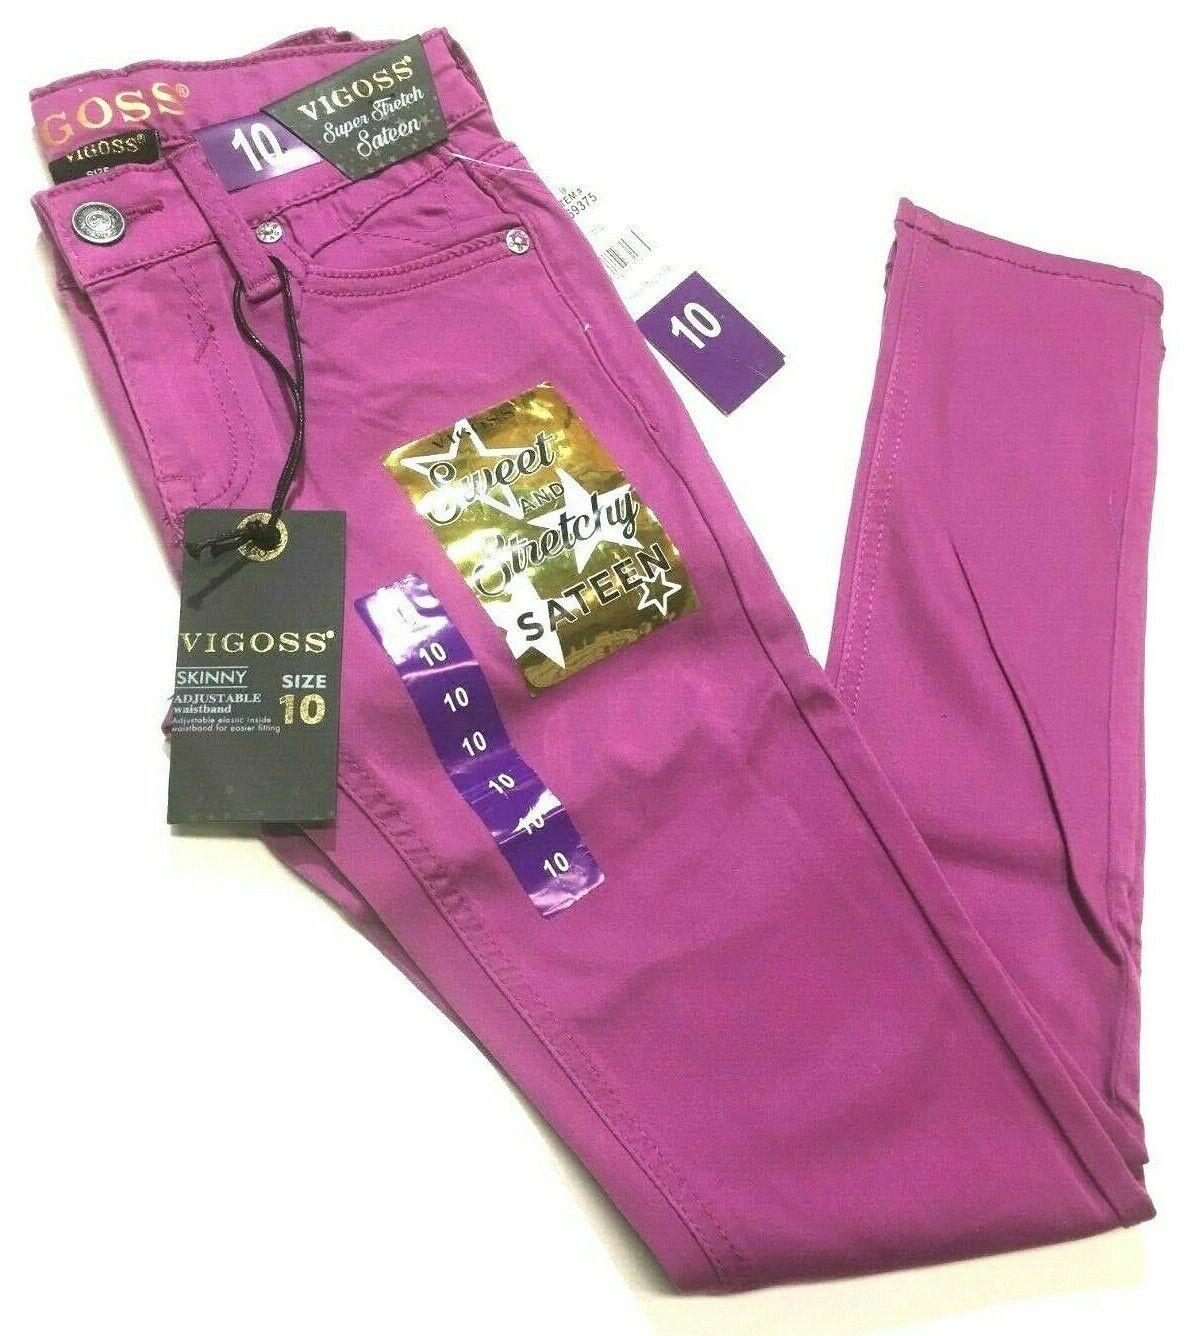 NEW Vigoss Girls' Skinny Super Stretch Sateen Jeans Pink Pan